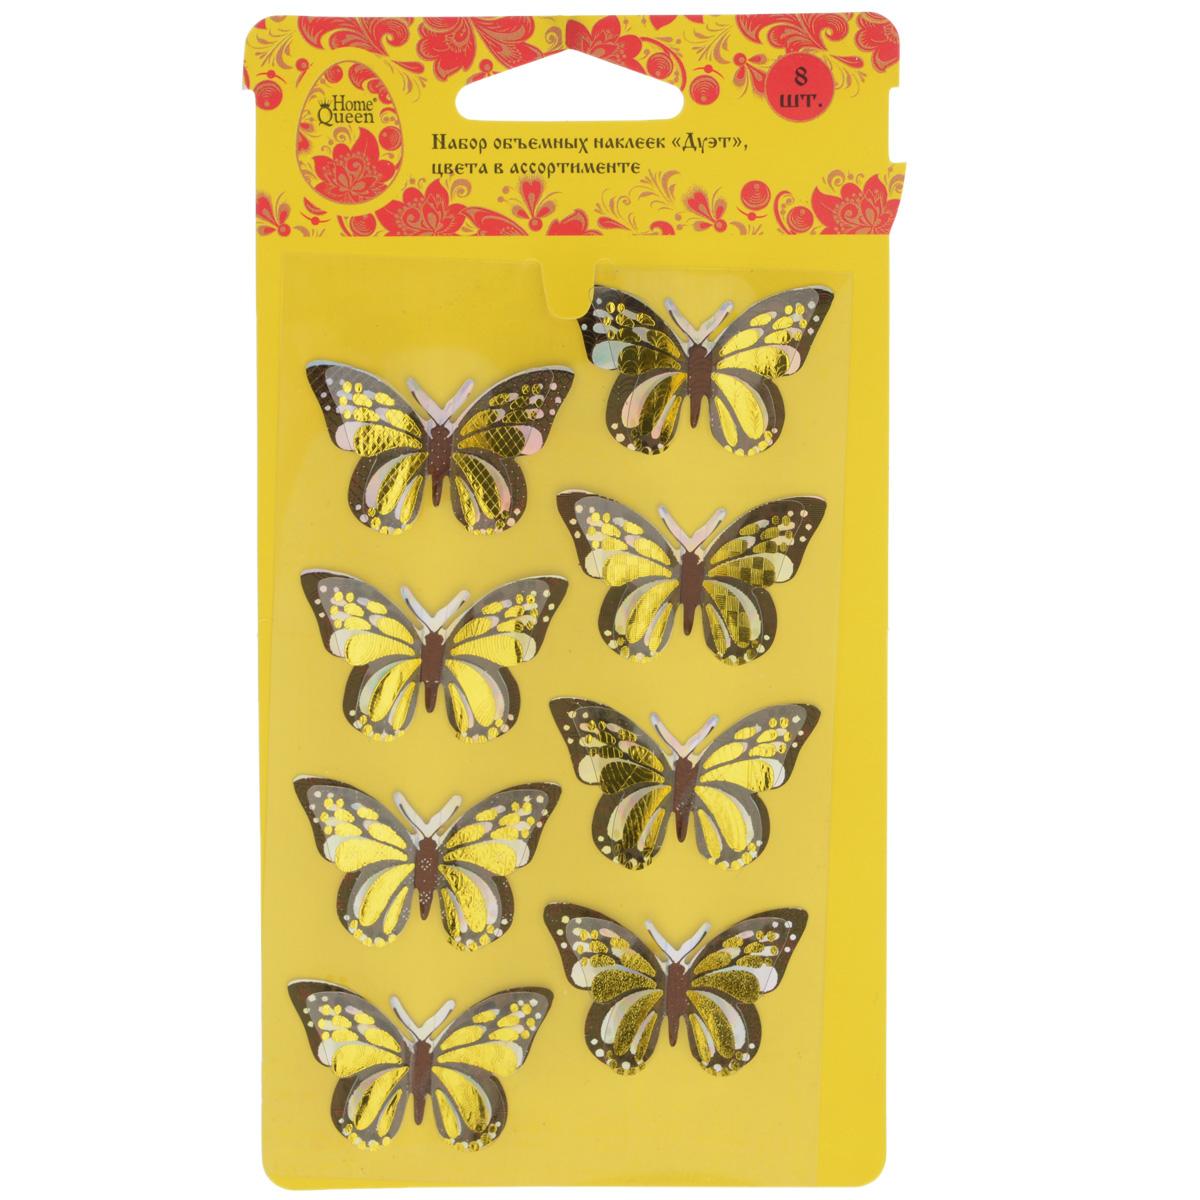 Набор объемных наклеек Home Queen Дуэт, цвет: черный, золотистый, 8 шт ahava набор duo deadsea mud набор дуэт